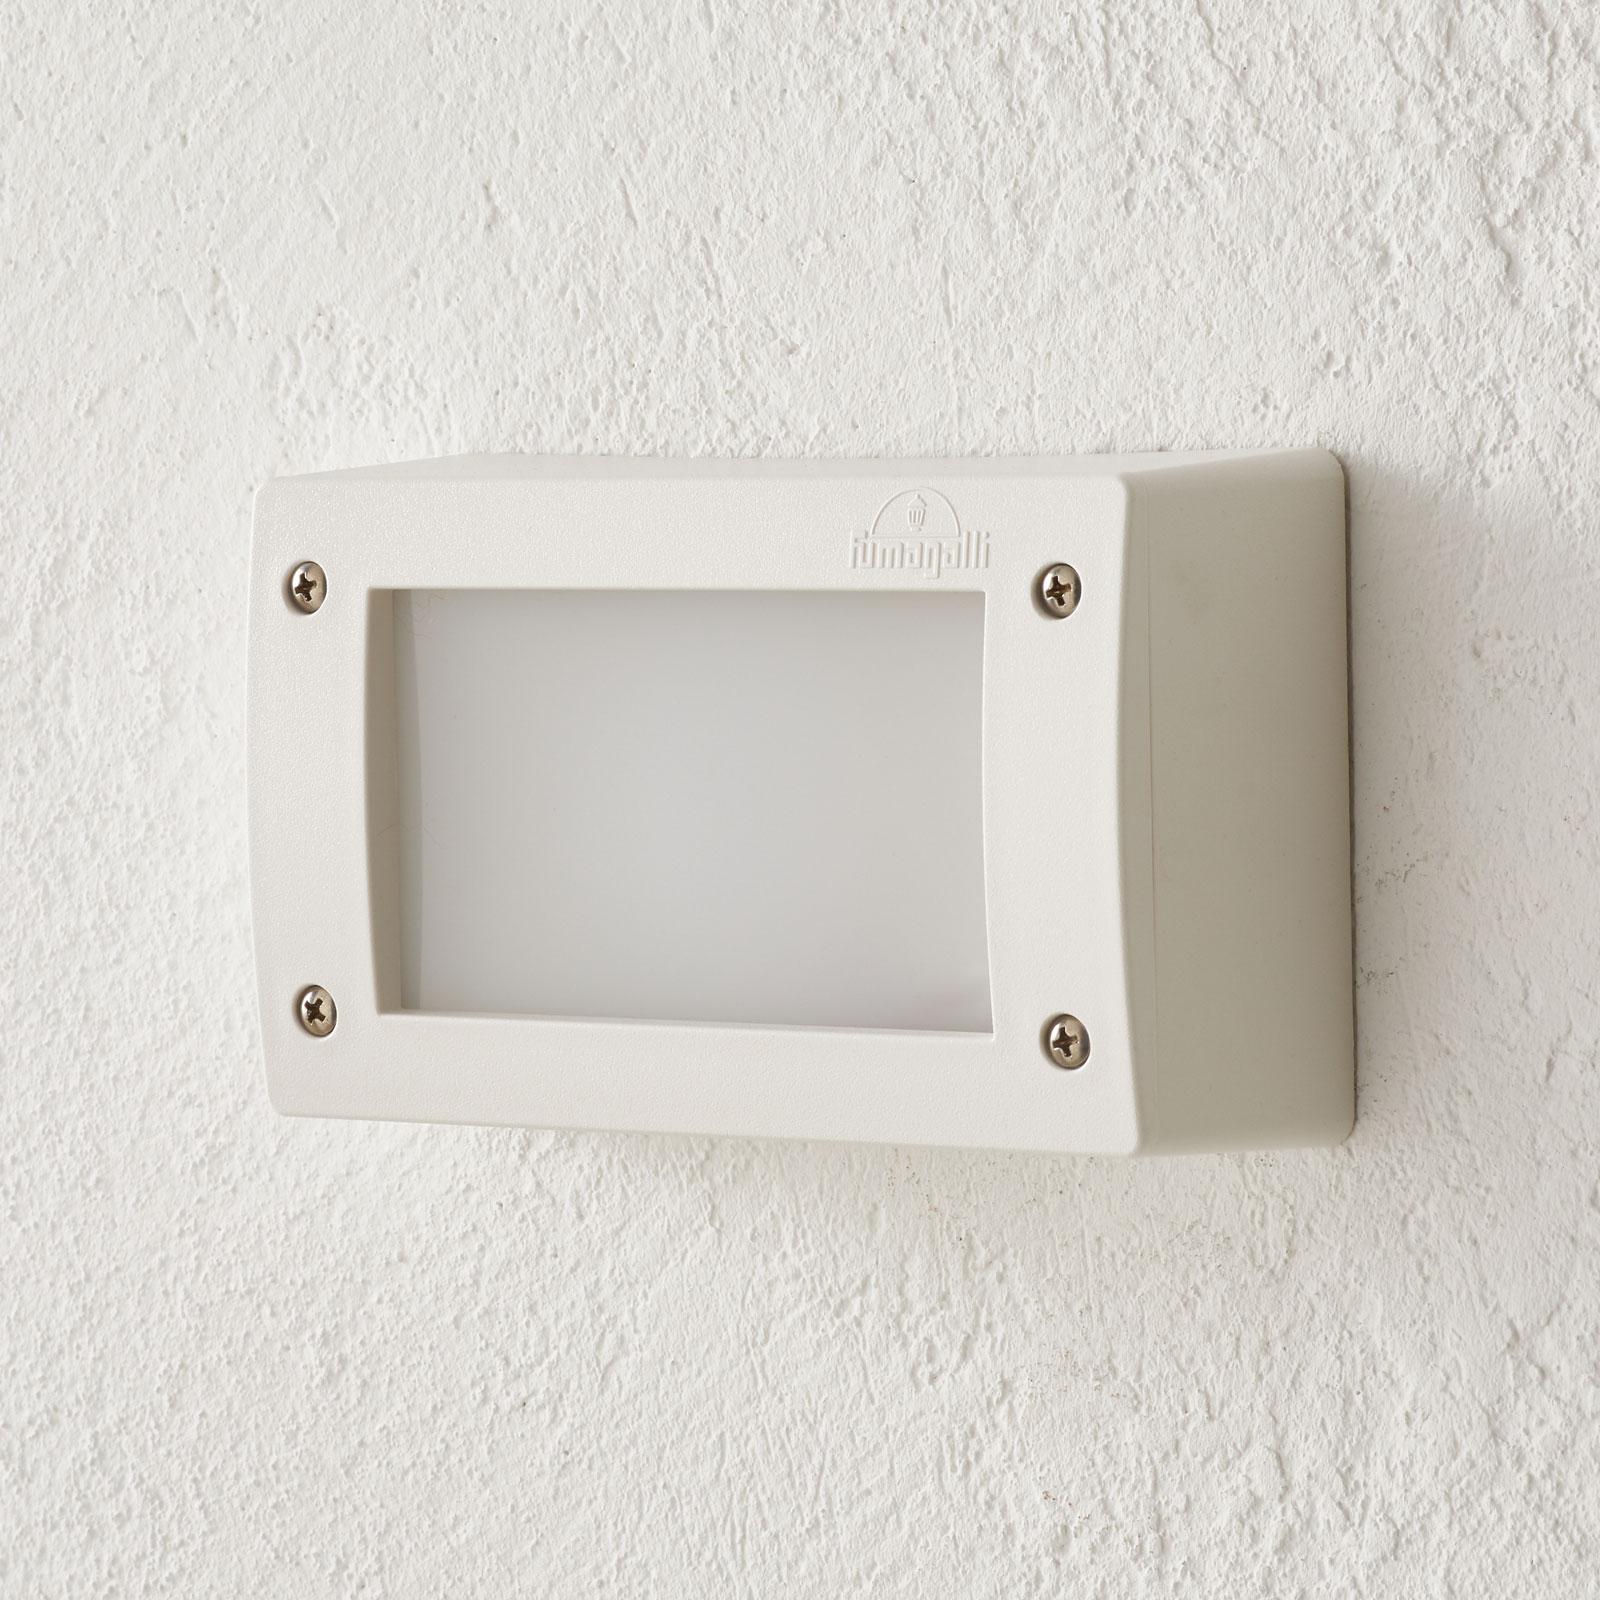 LED-Wandanbauleuchte Extraleti 200, rechteckig